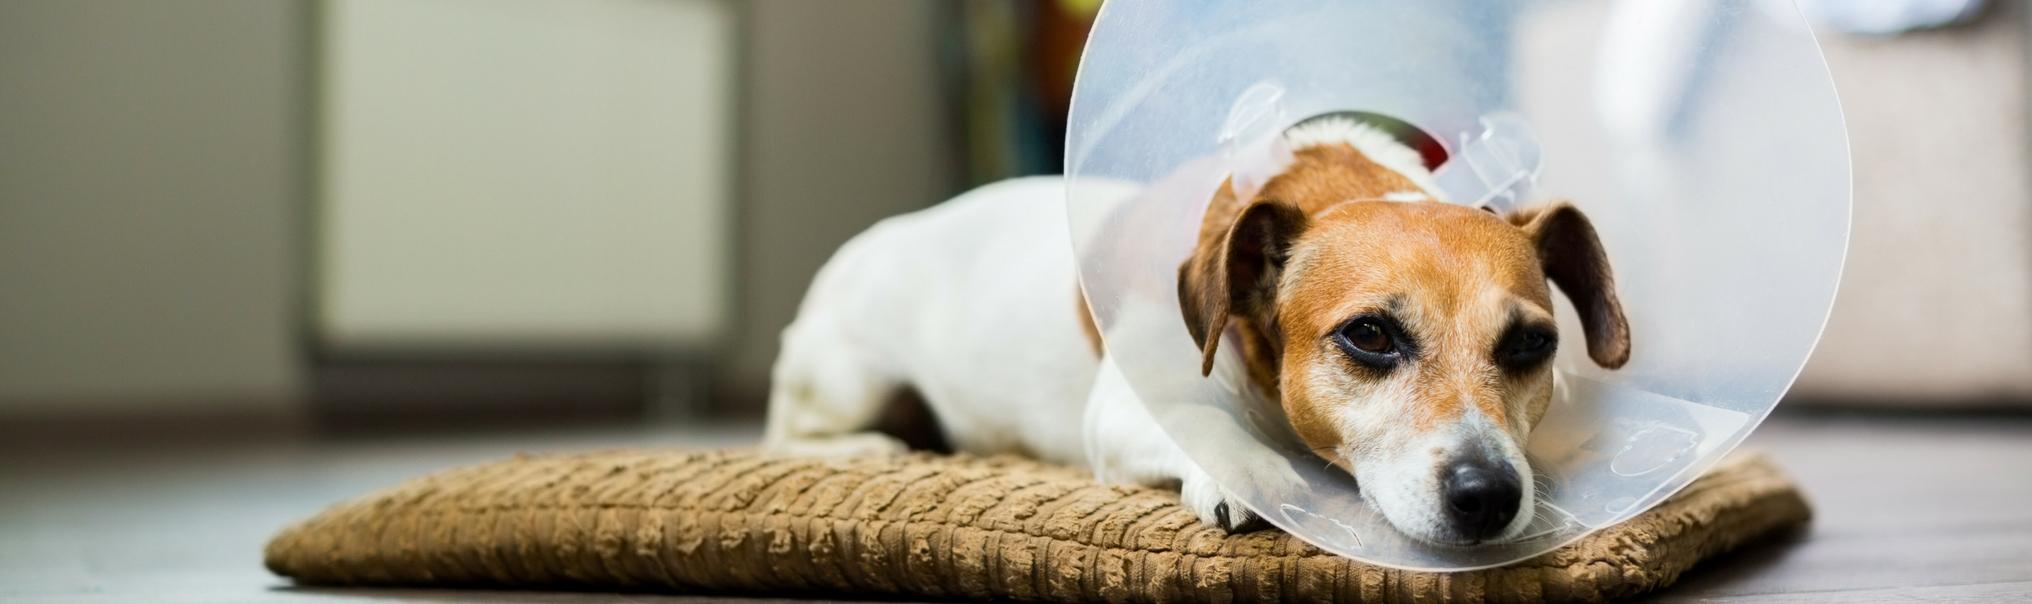 Dog spay neuter cost